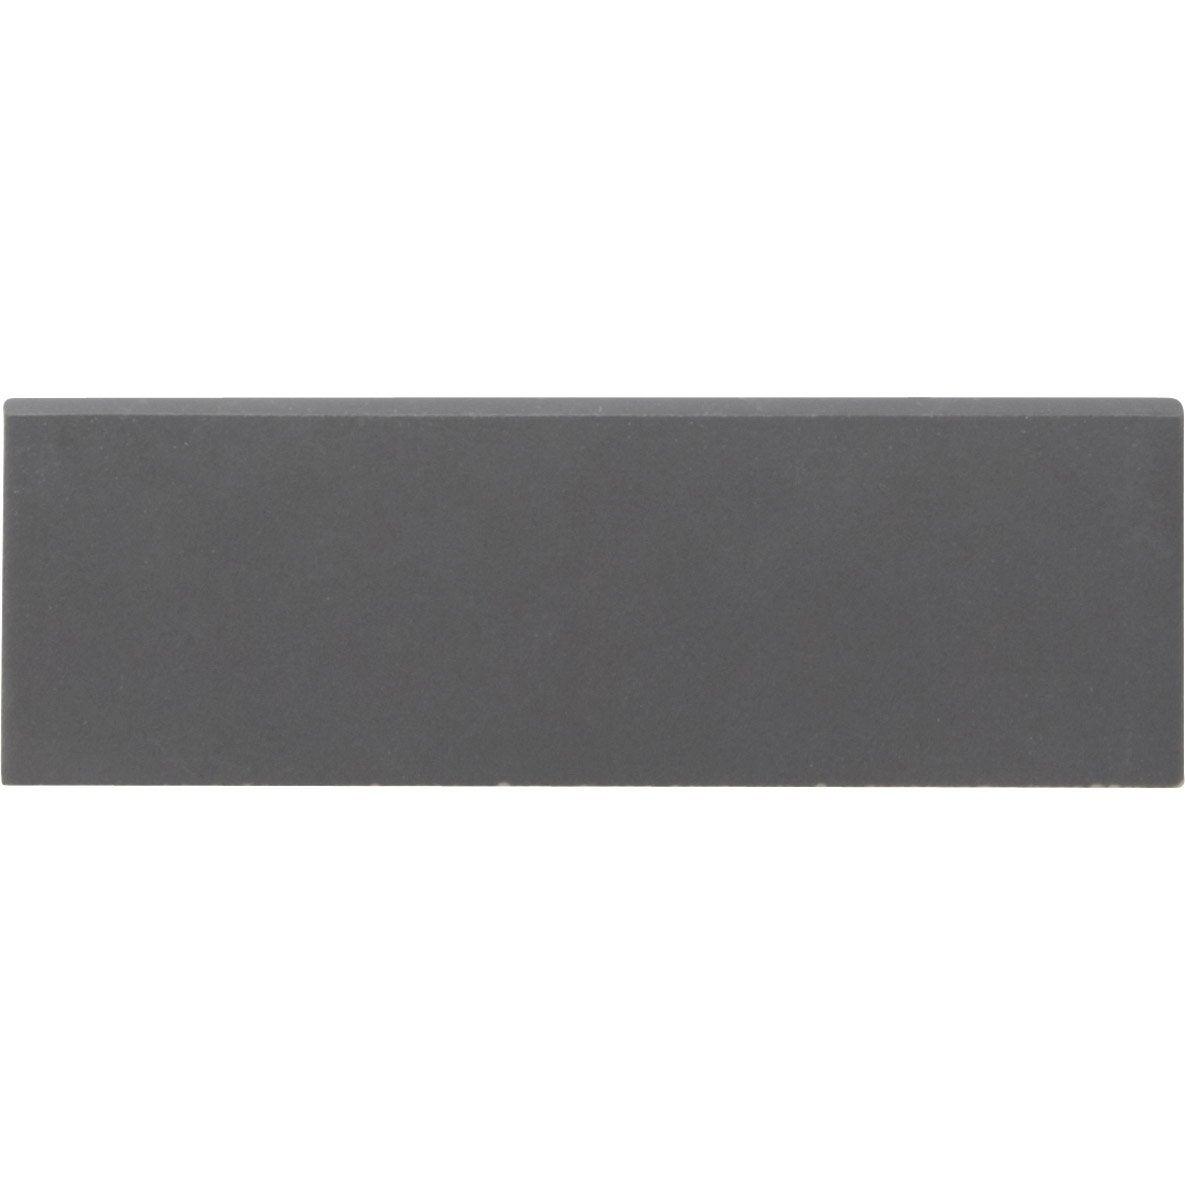 Lot de 6 plinthes gatsby noir l 6 5 x cm leroy merlin - Leroy merlin frise carrelage ...